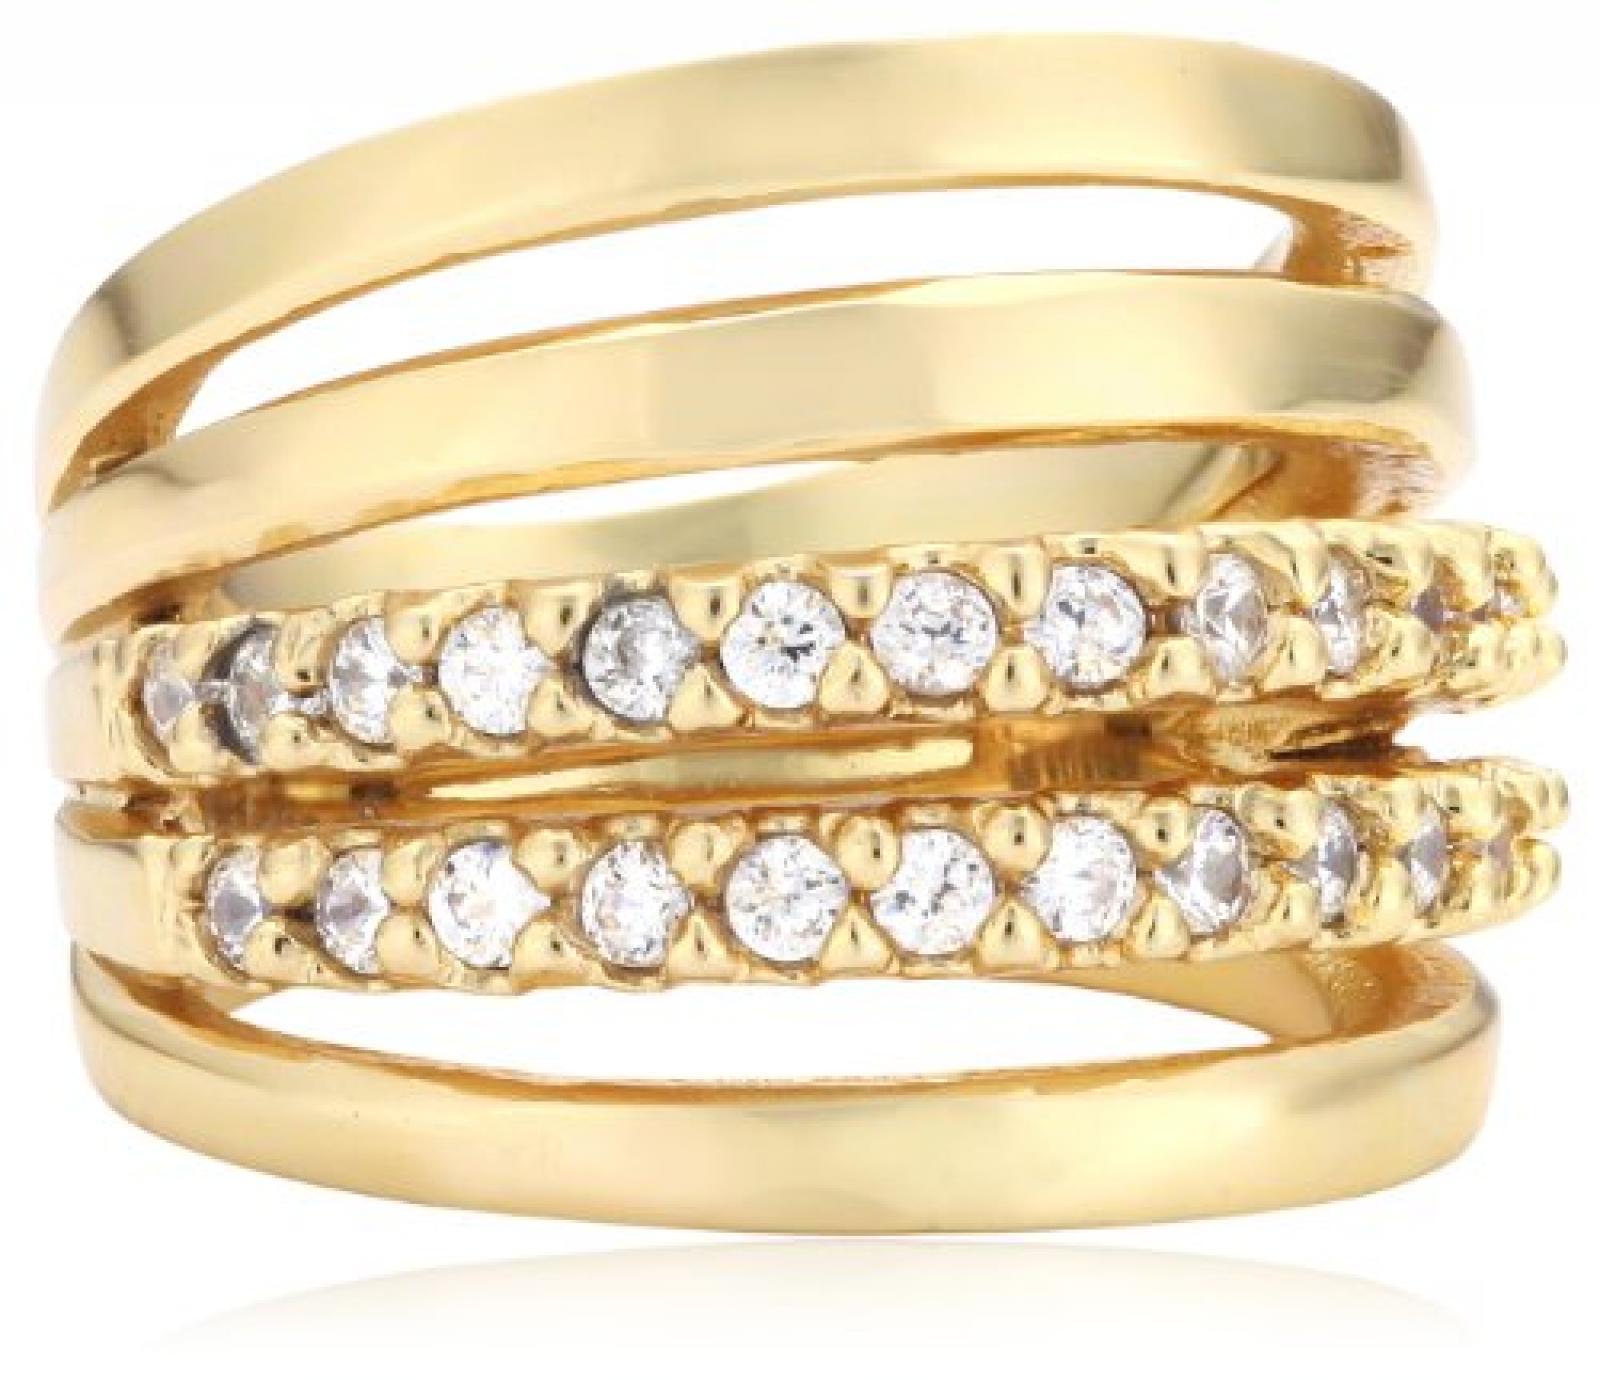 Mike Ellis New York Damen-Ring Edelstahl Zirkonia weiß Gr.52 (16.6) D1519C/3